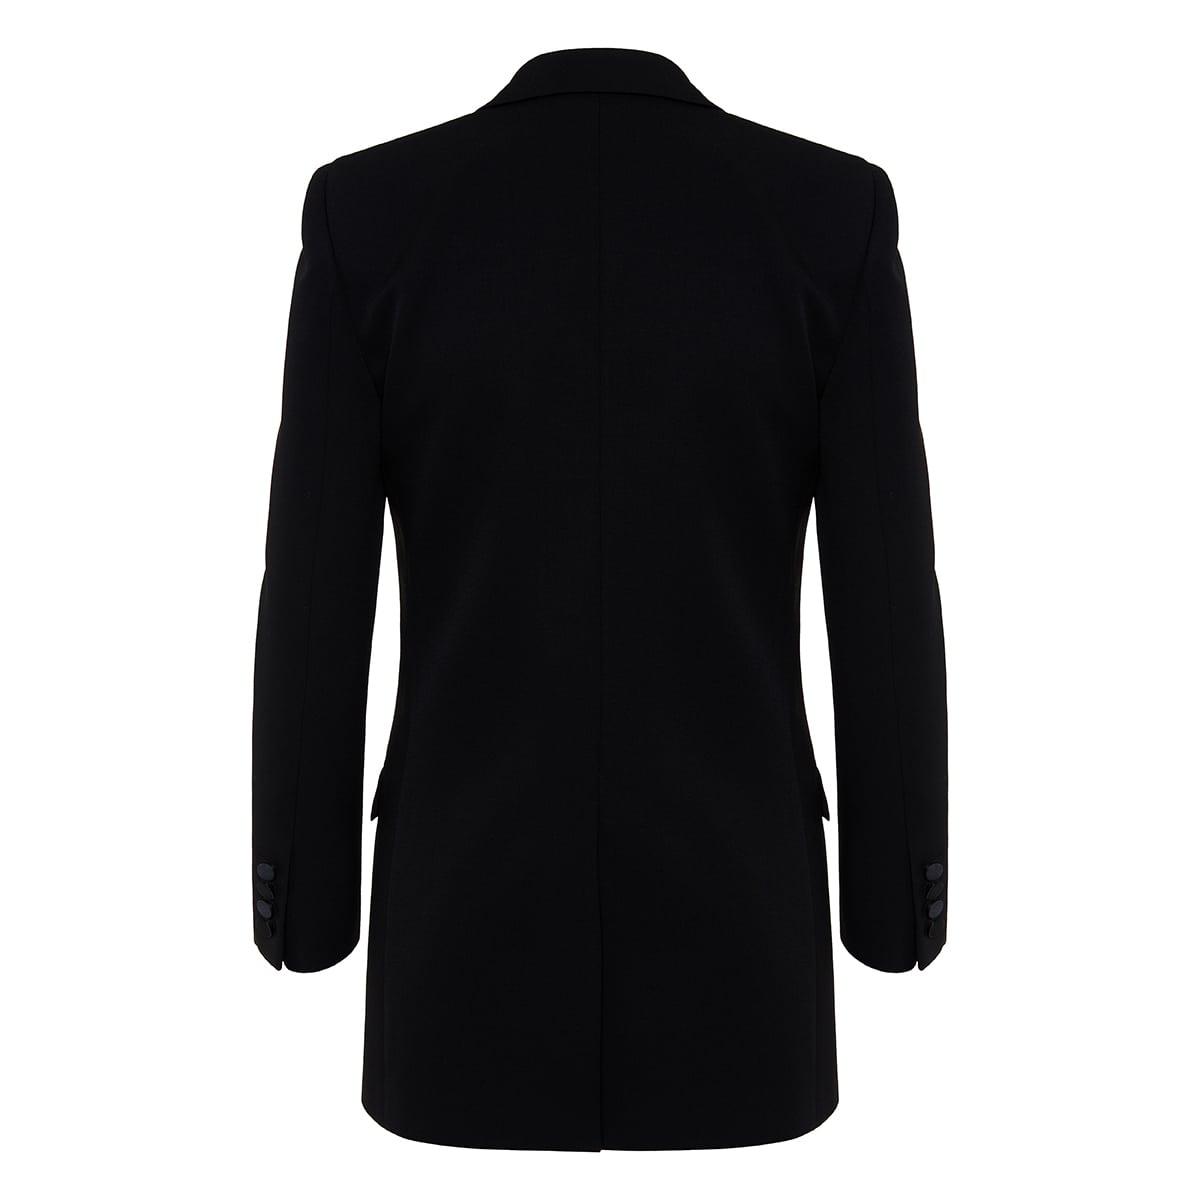 Satin-trimmed tuxedo blazer